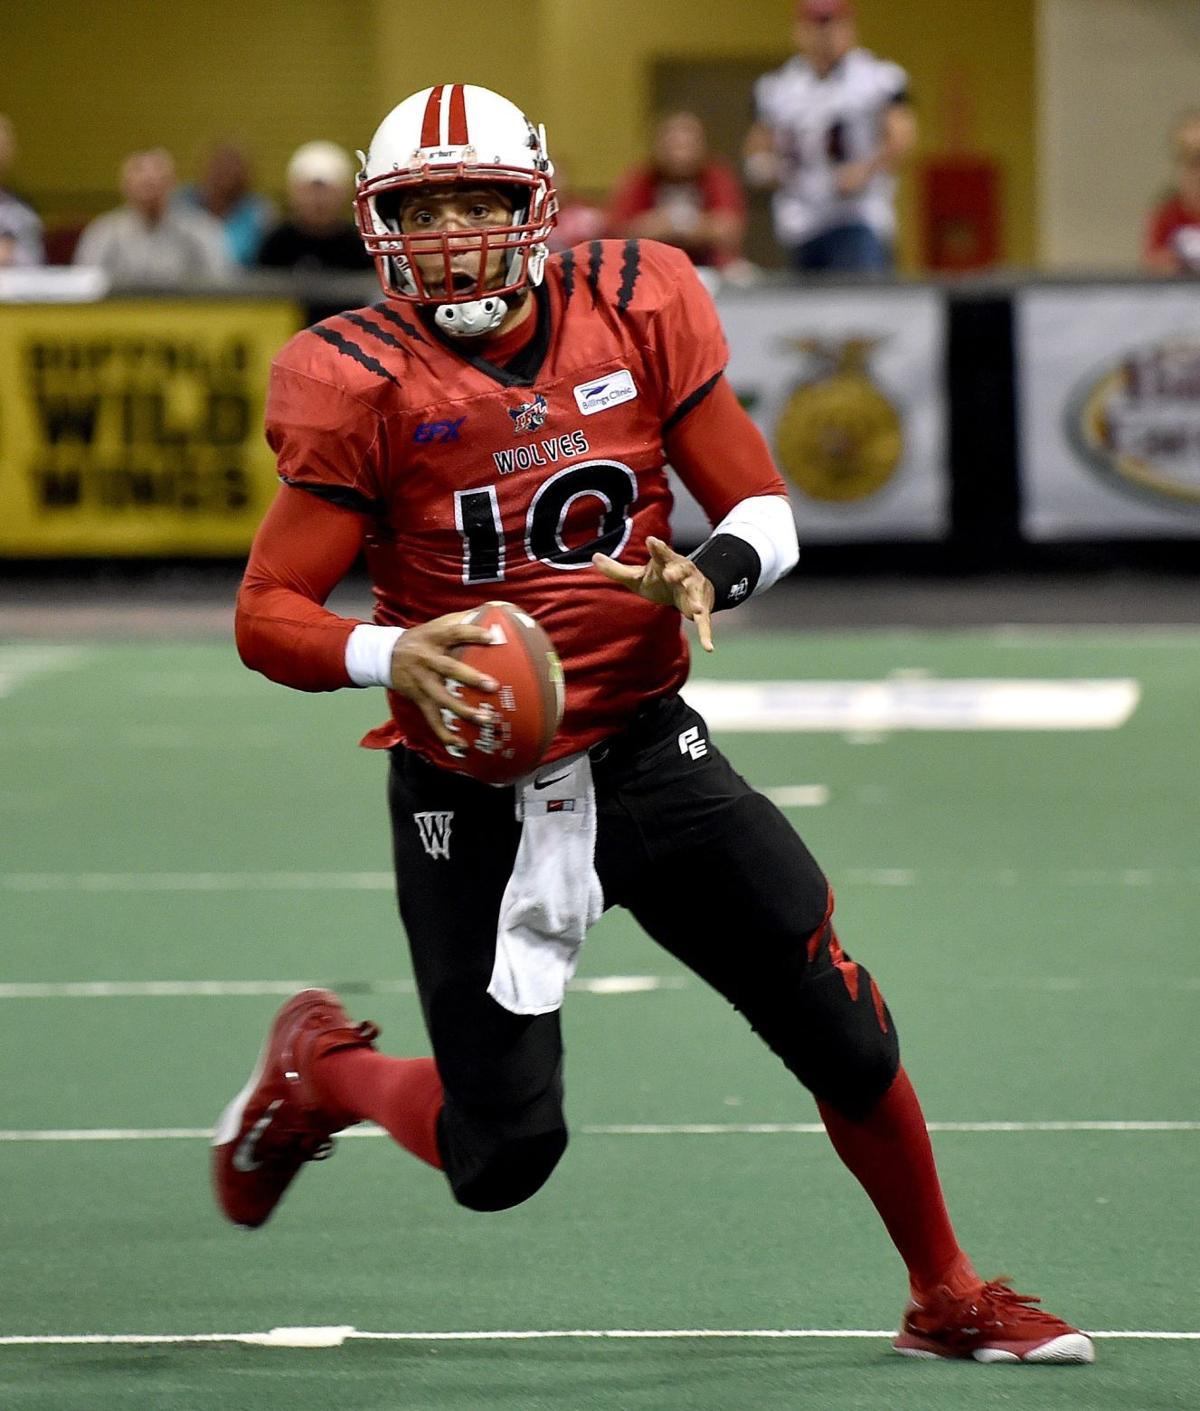 Quarterback Cory Murphy